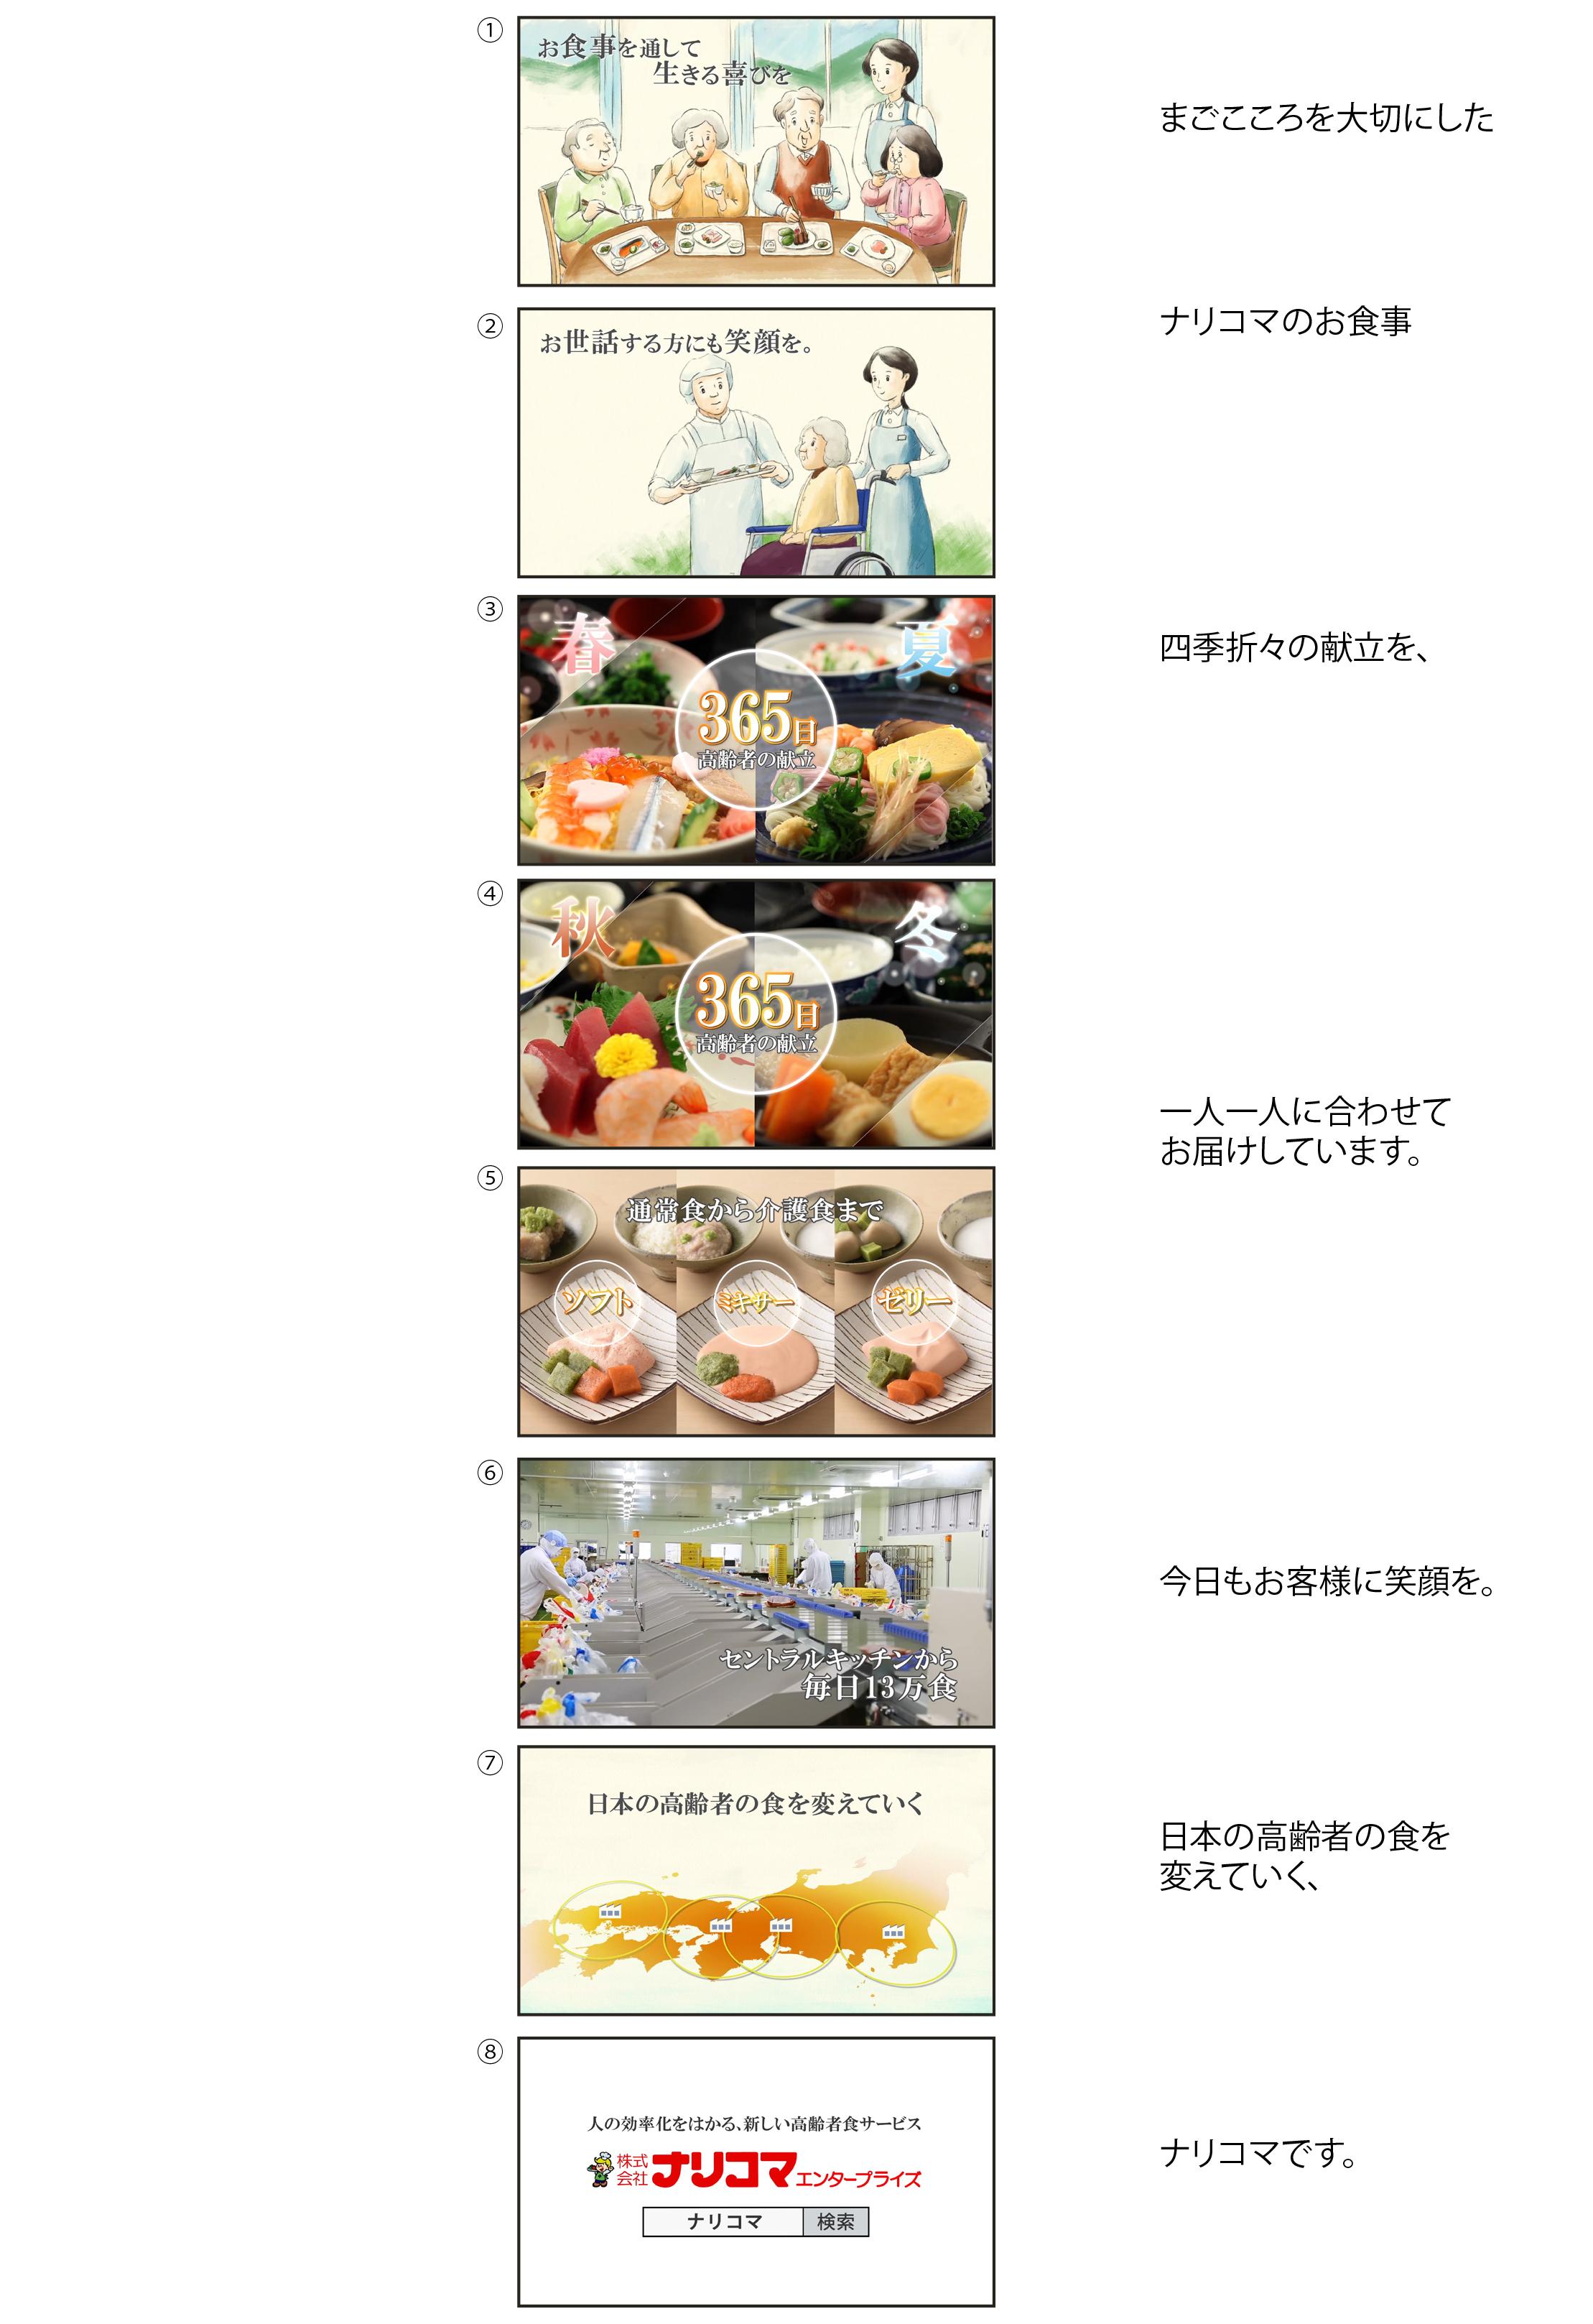 narikoma_cutsheet_1217-1